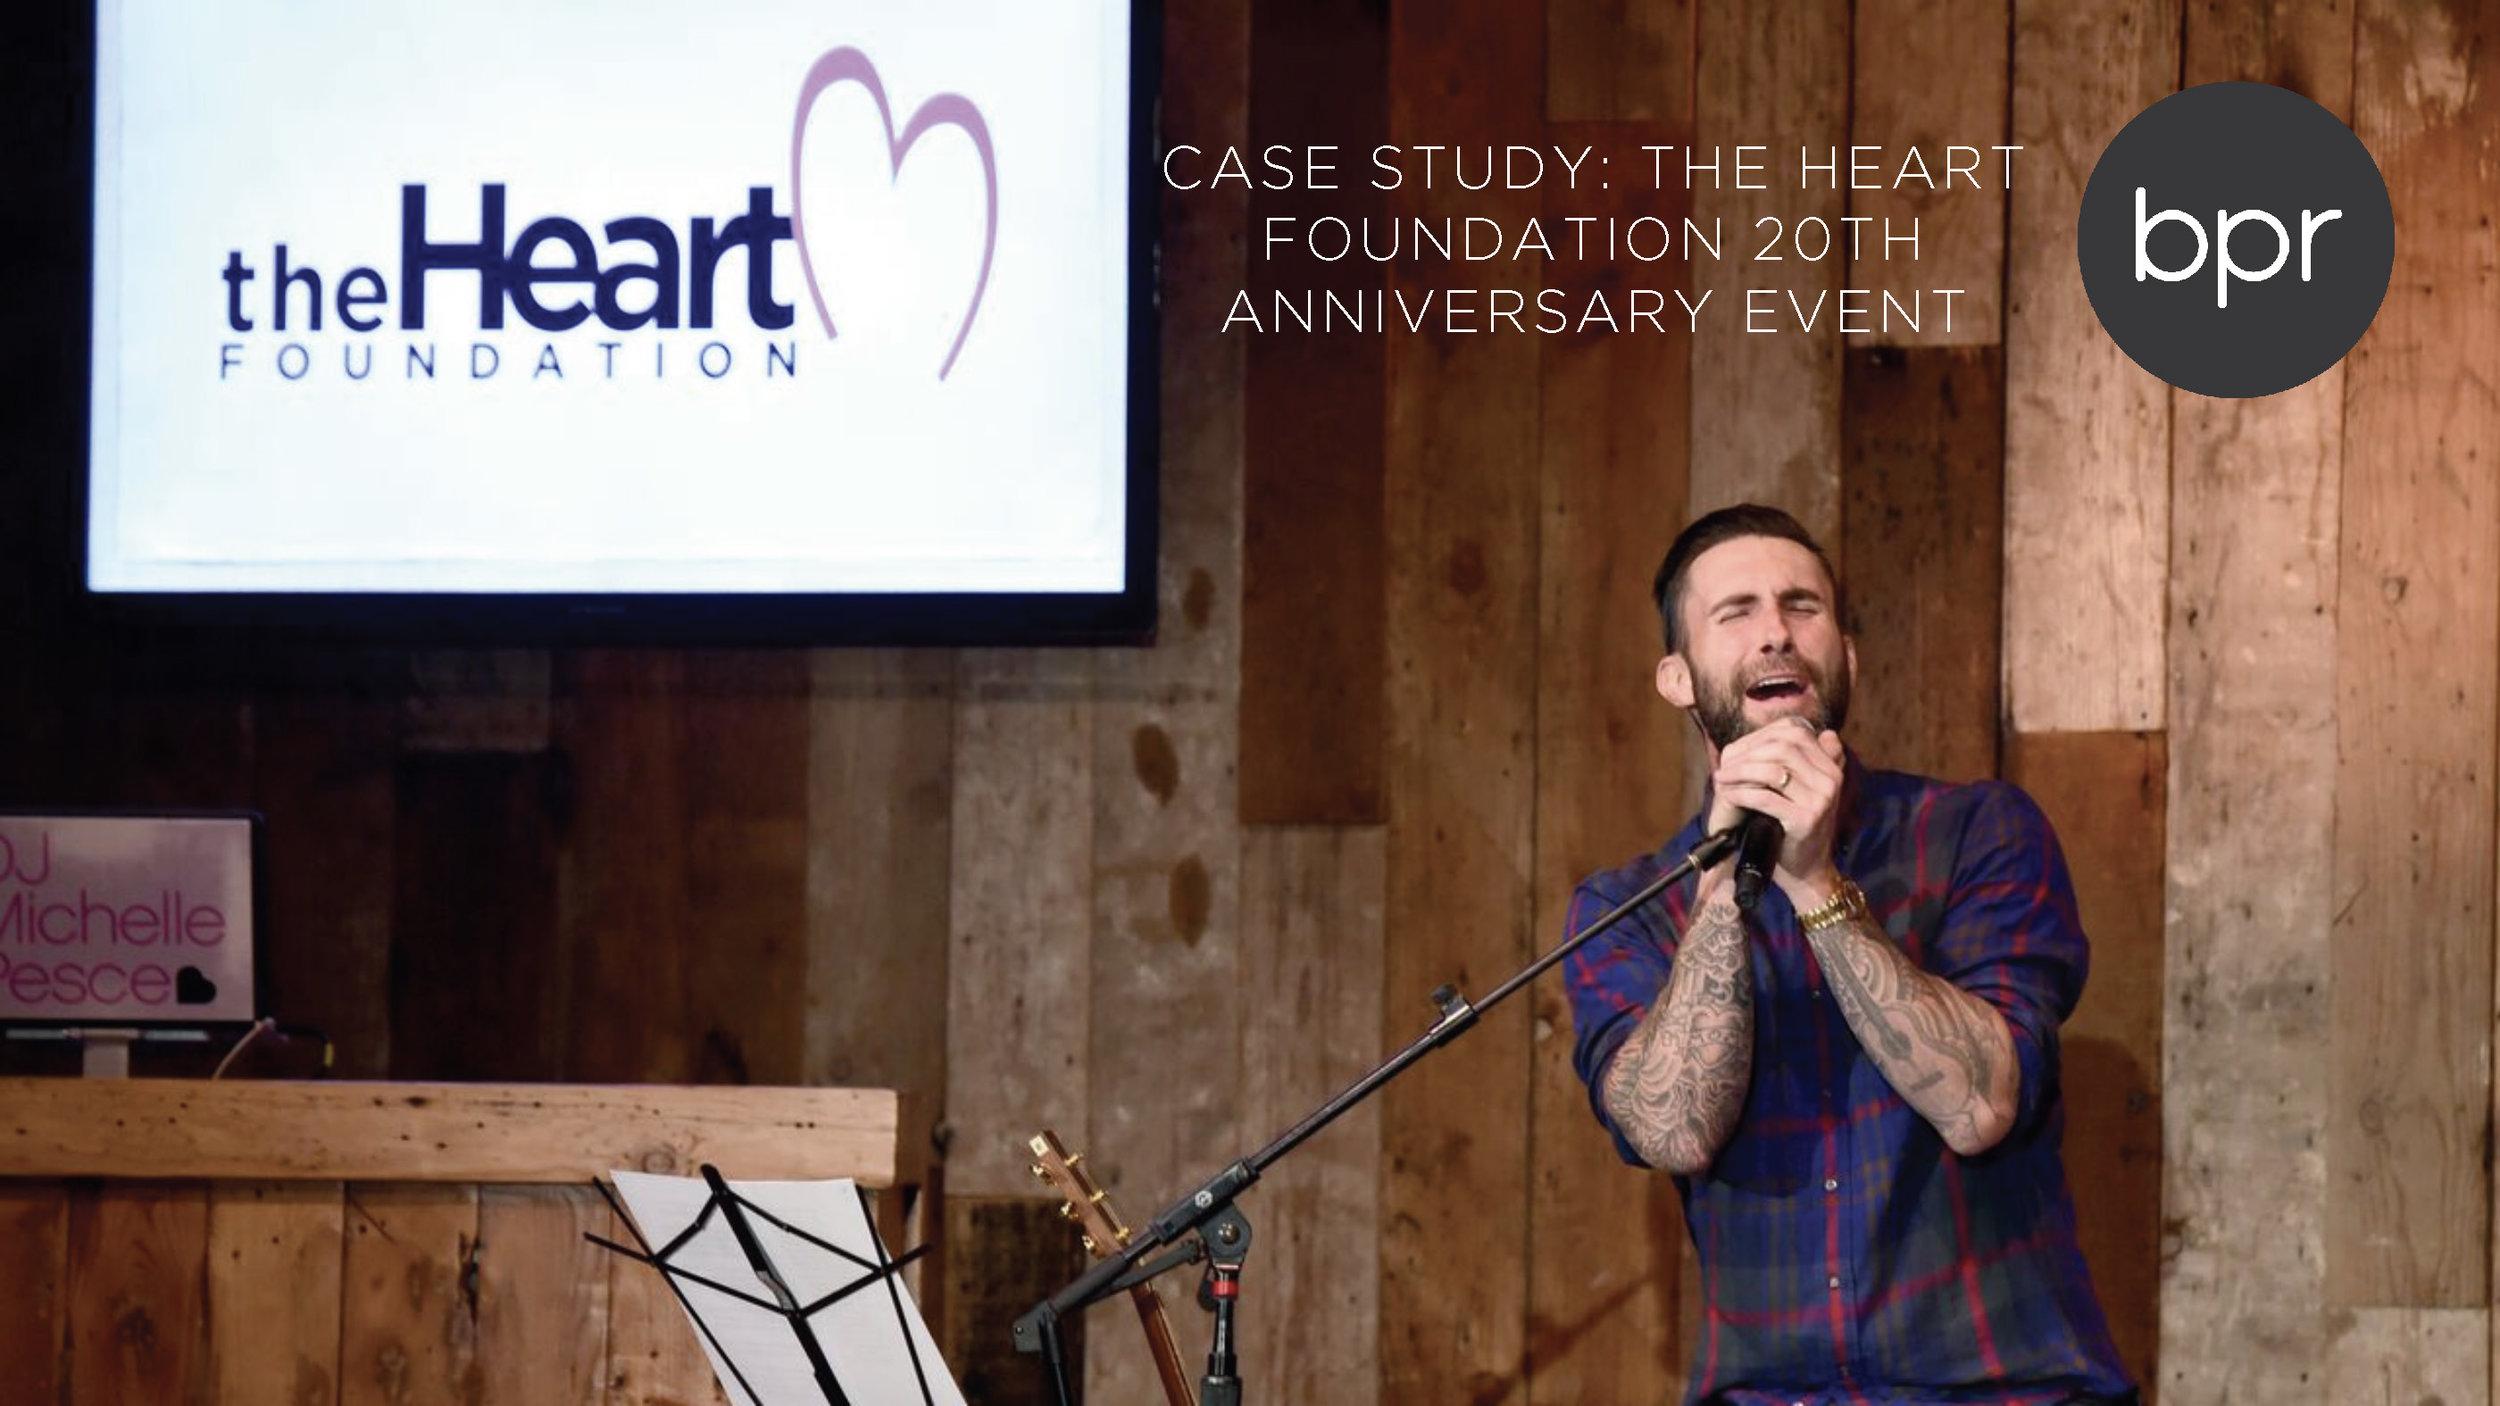 Heart Foundation Case Study_Page_1.jpg